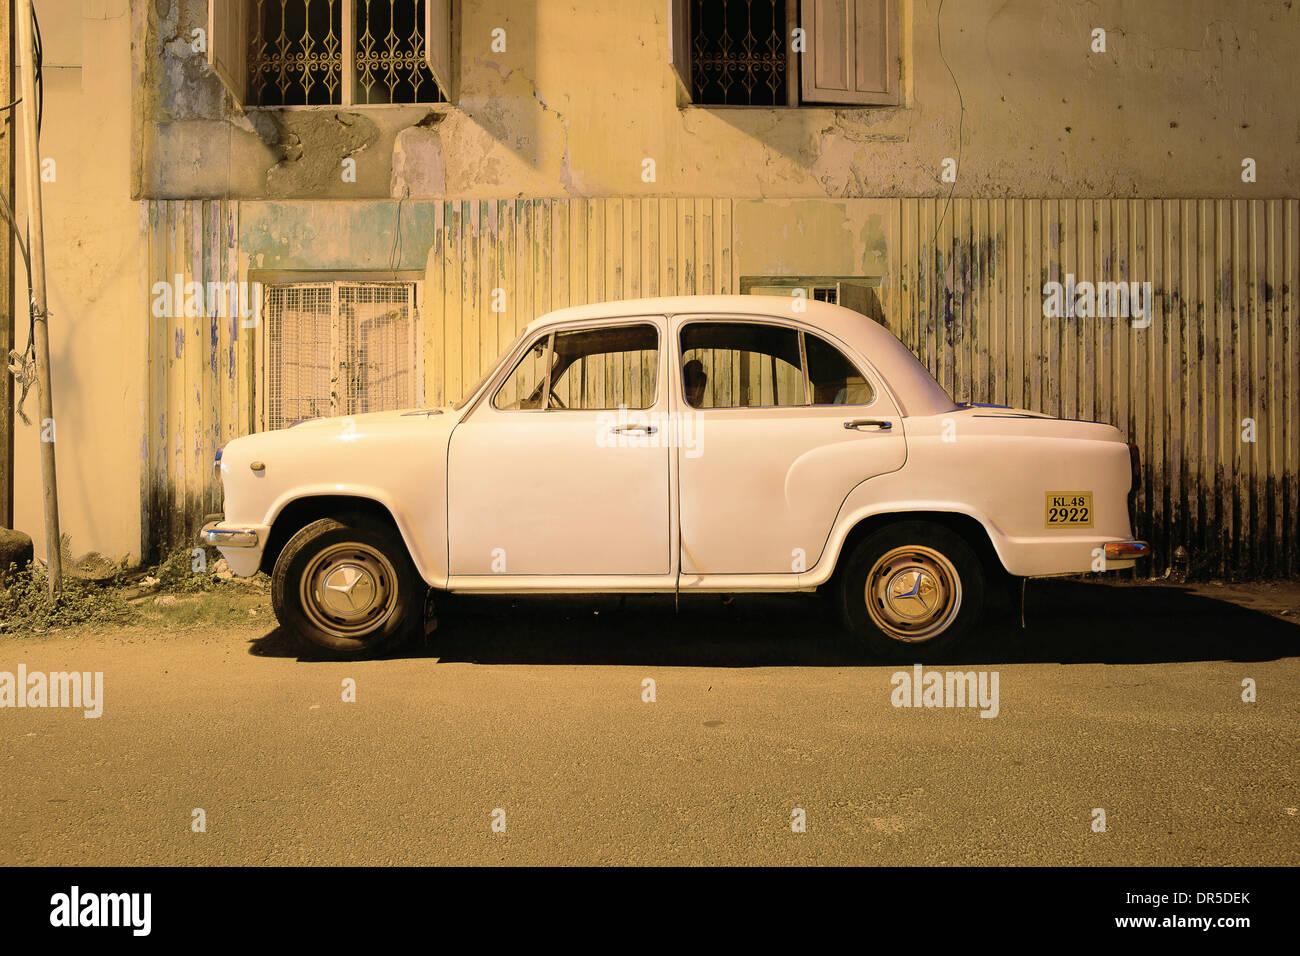 El Embajador coche,India Foto de stock